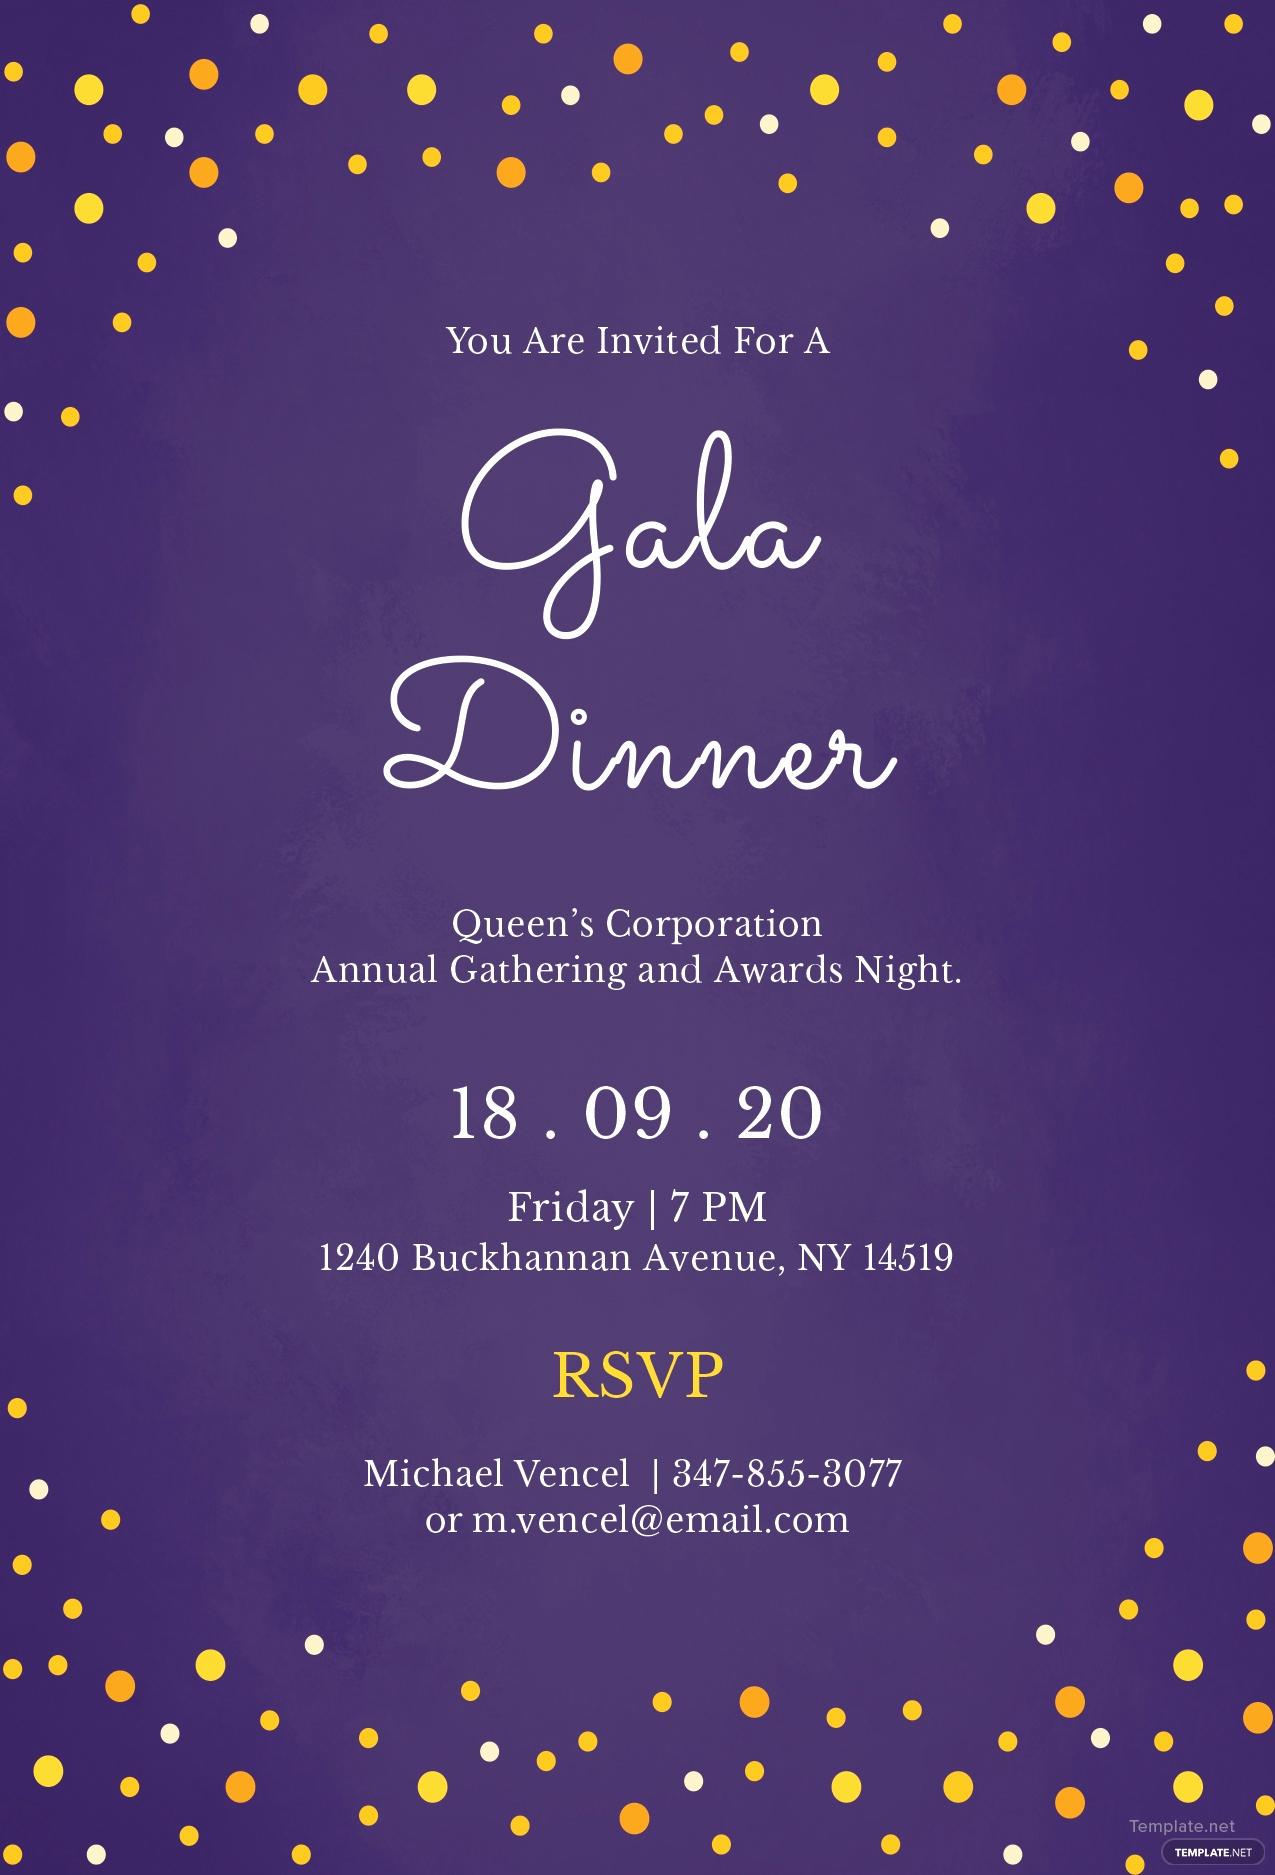 Free Online Invitation Templates Unique Free Gala Dinner Night Invitation Template In Illustrator